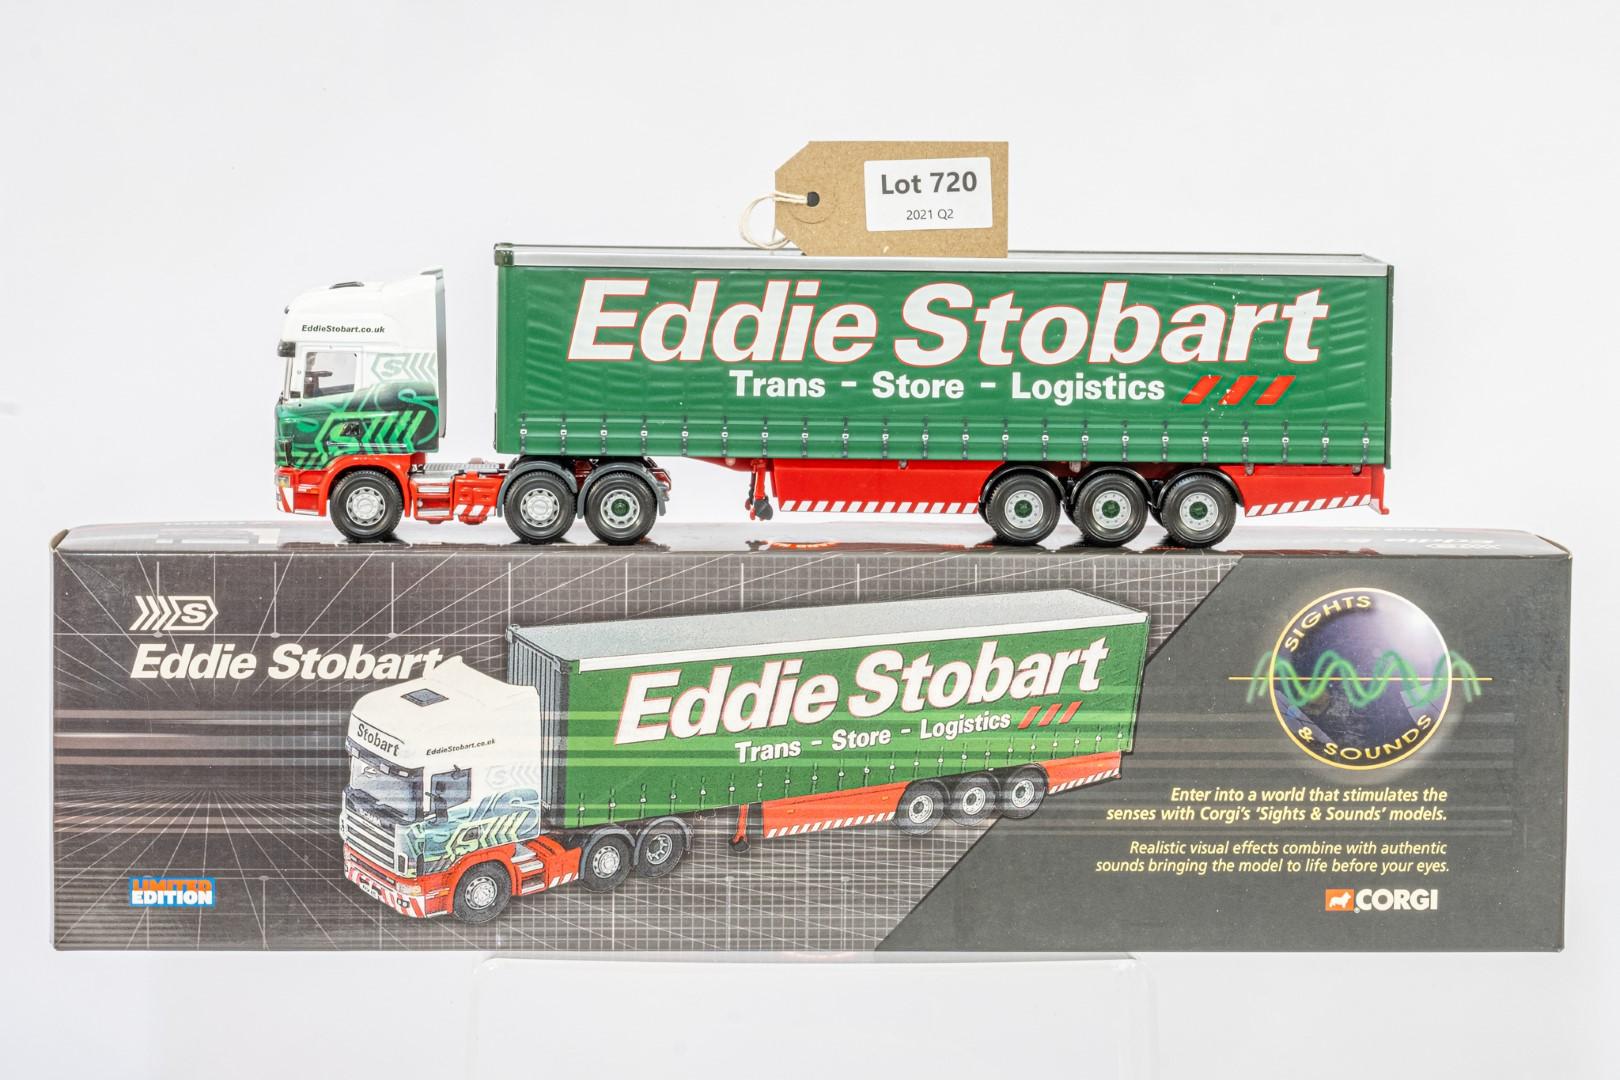 Corgi Scania Topline Curtainside Trailer - Eddie Stobart - Sights & Sounds